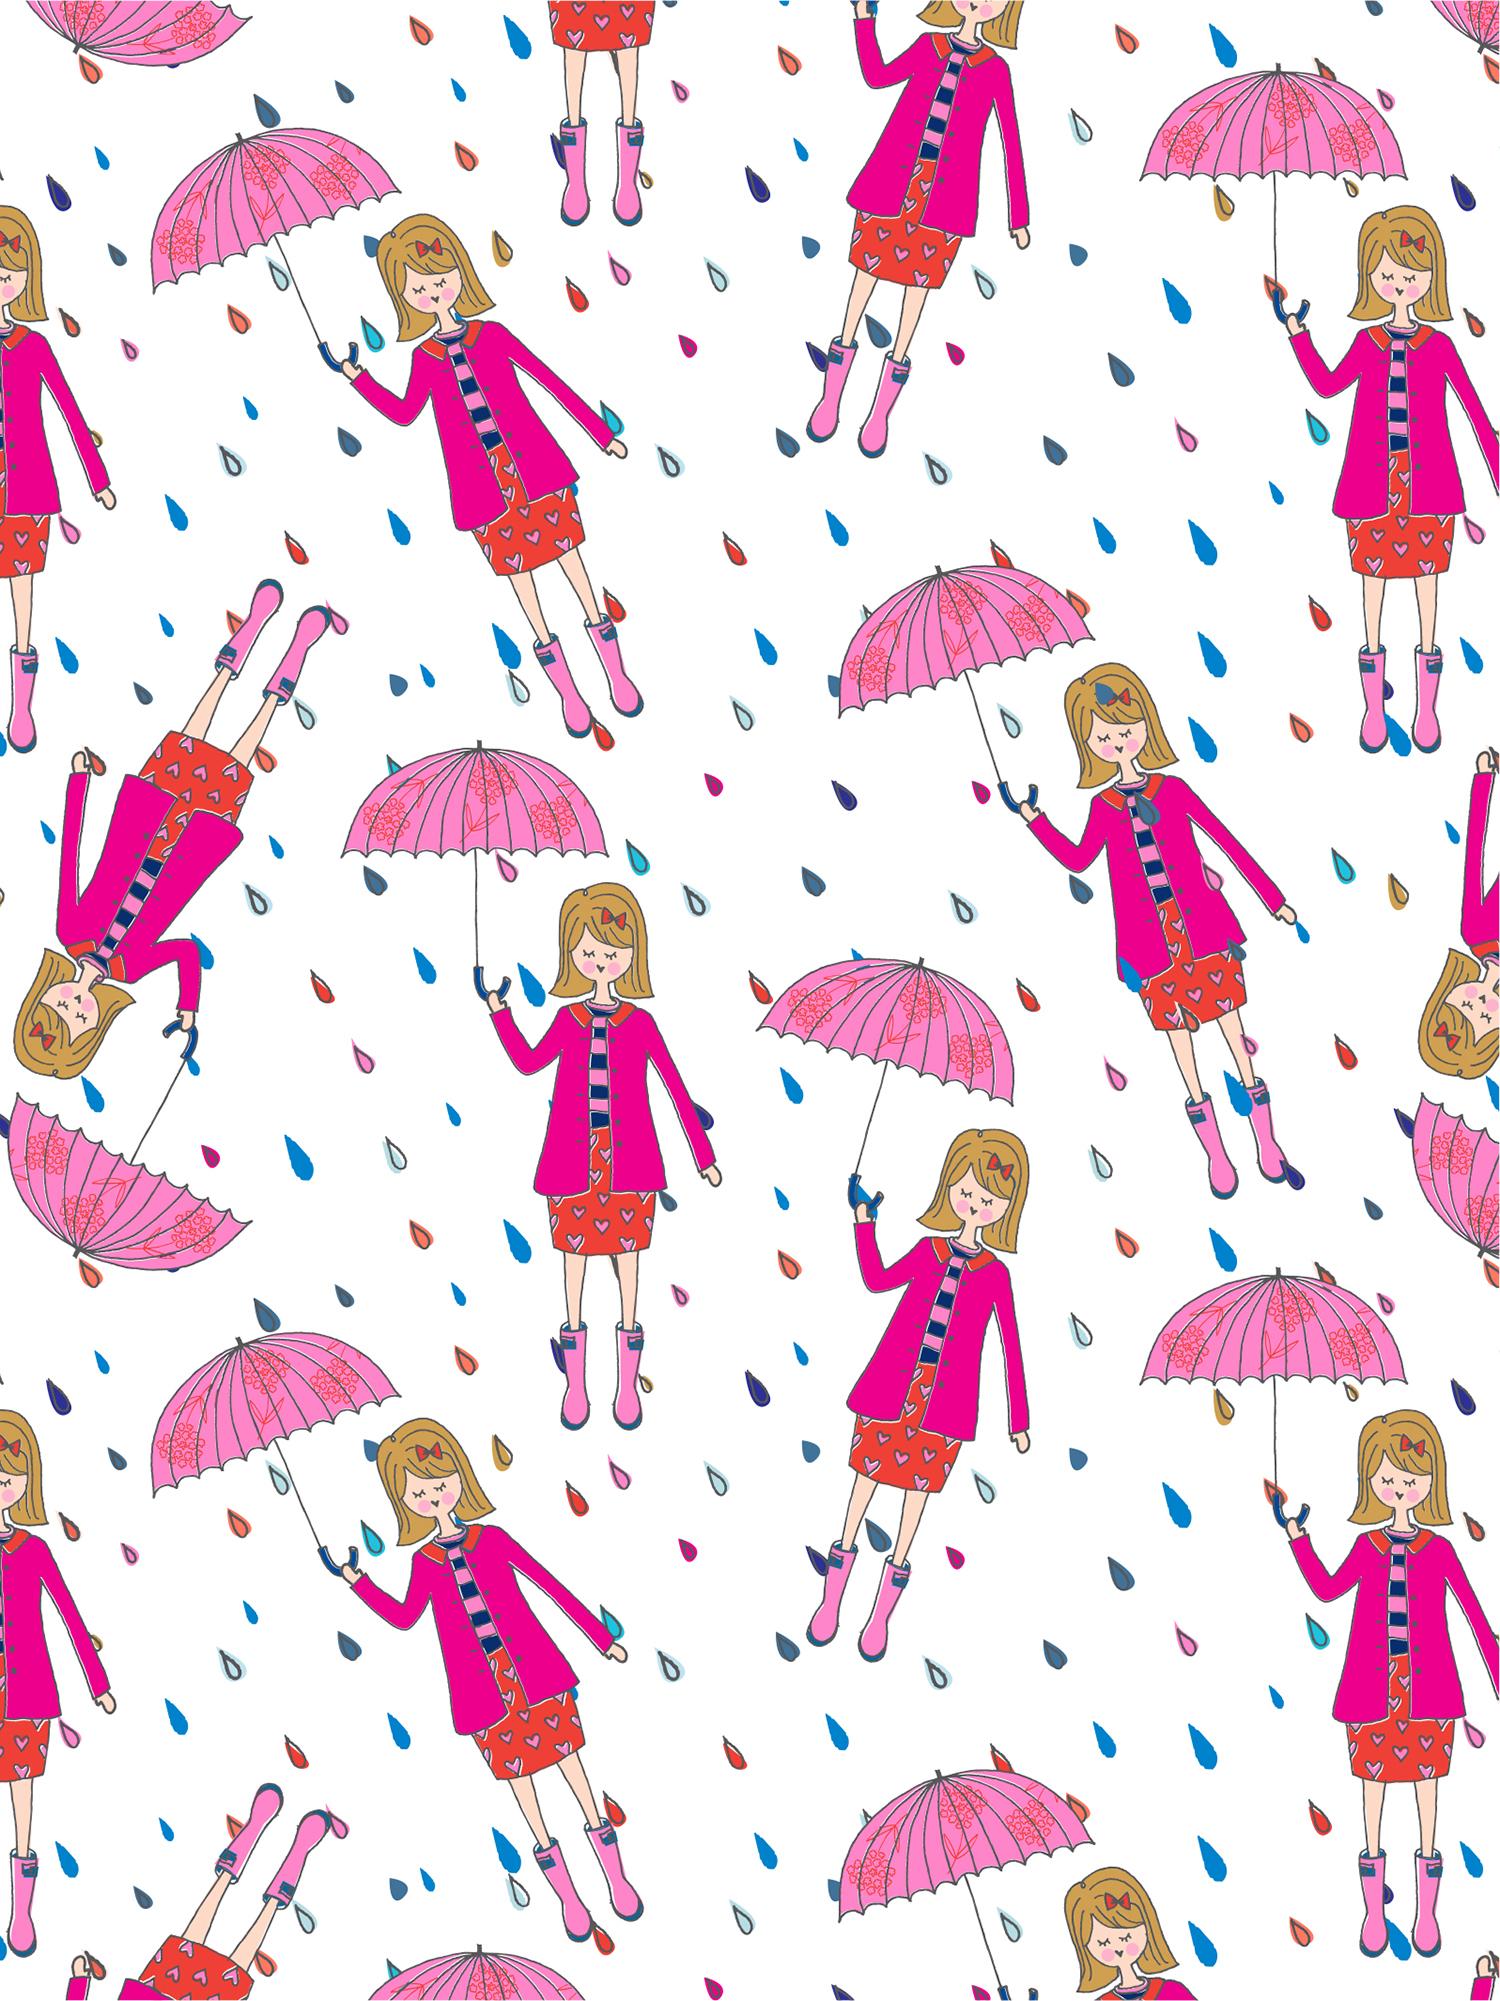 jami_darwin_girl_in_the_rain.jpg